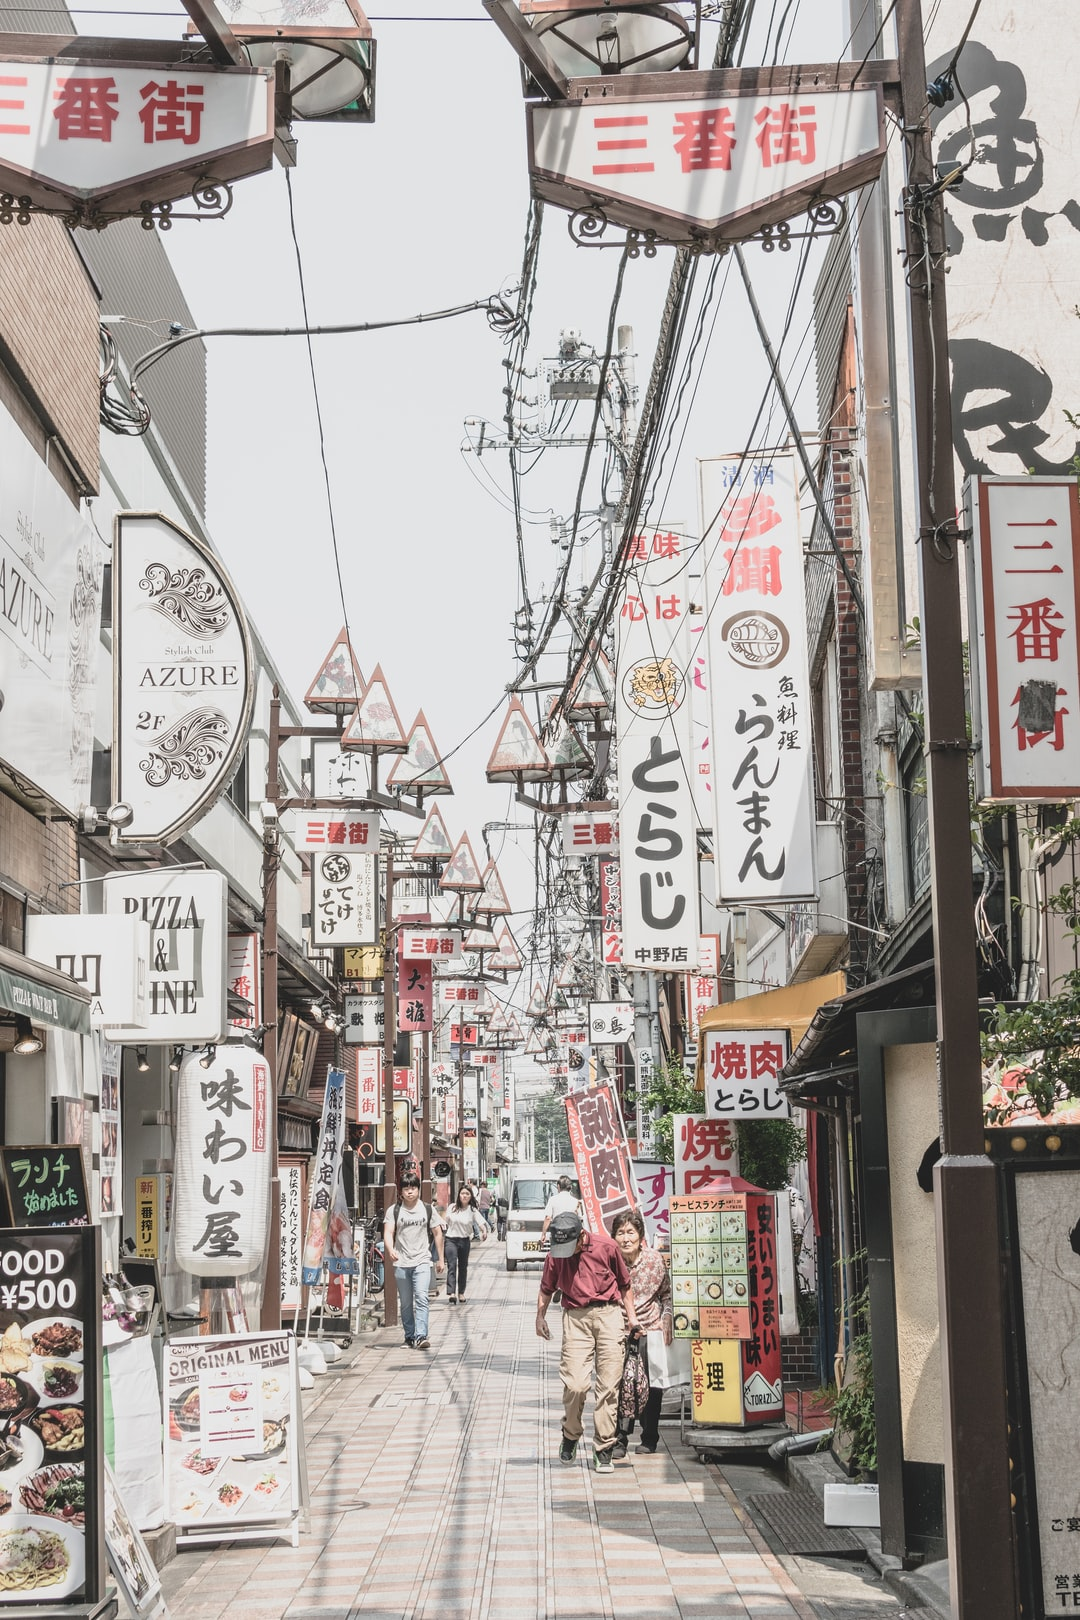 Busy signage in Nakano, Tokyo